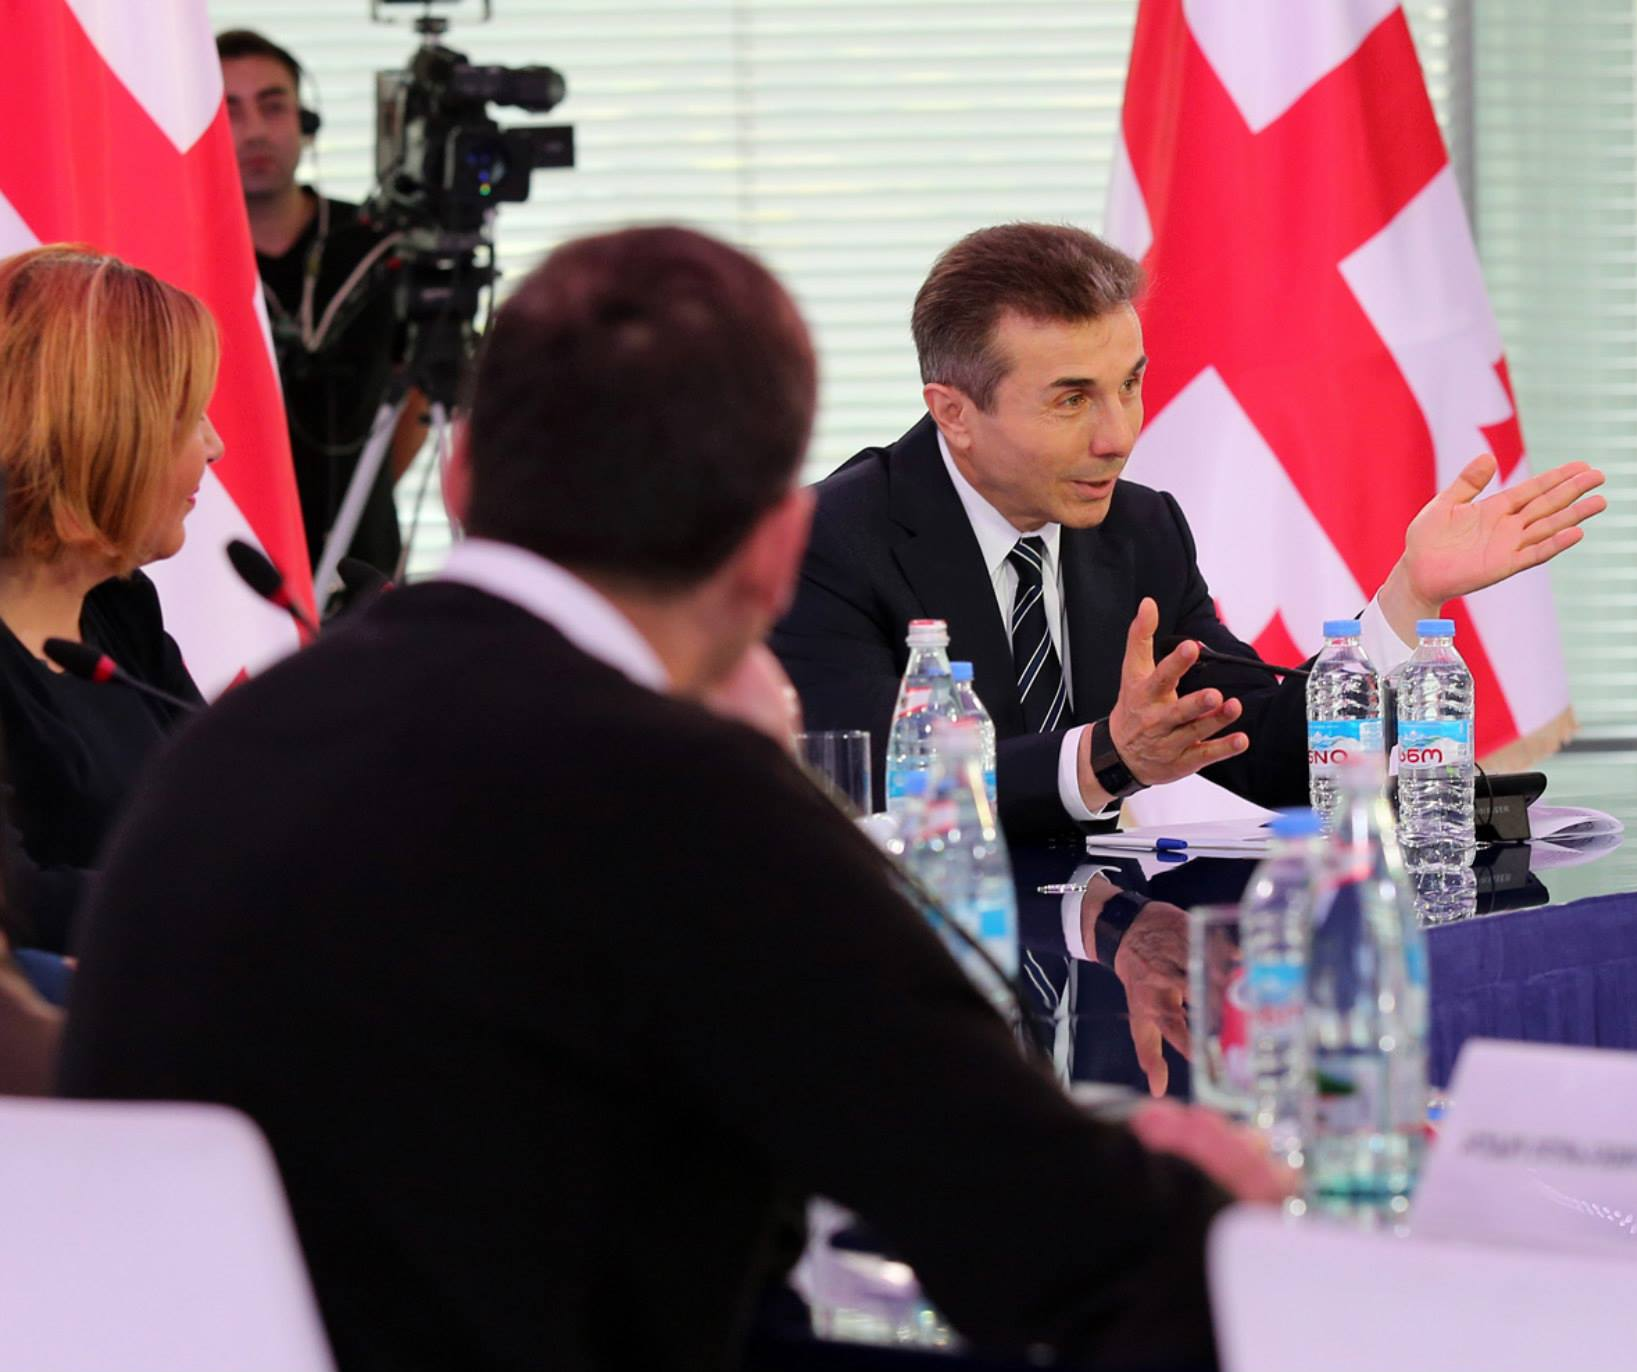 bidzina_ivanishvili_and_journalists